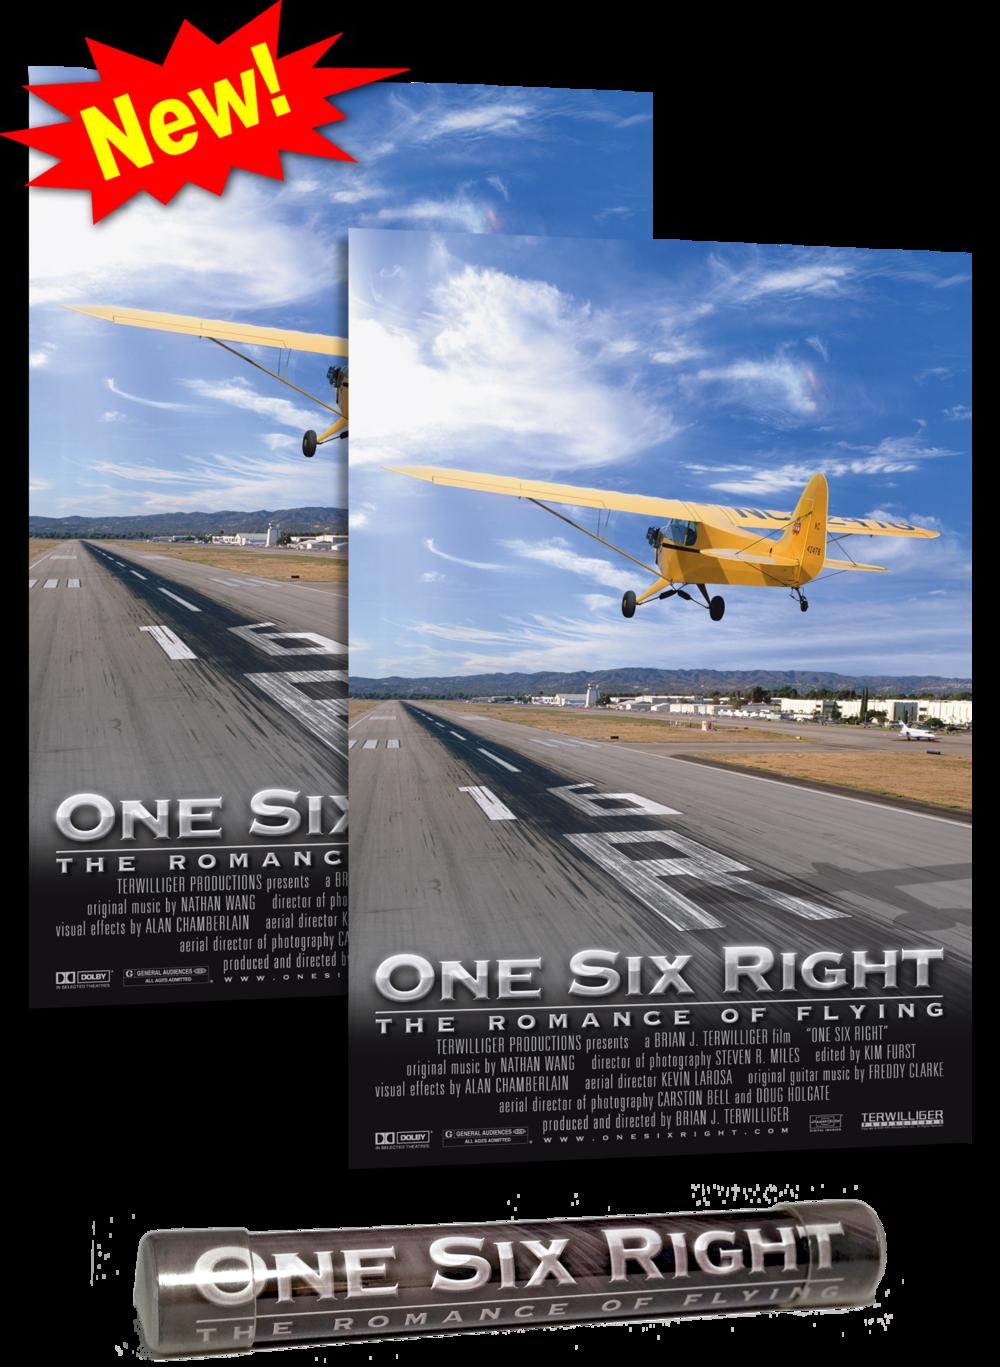 Movie Posters [2-pack]